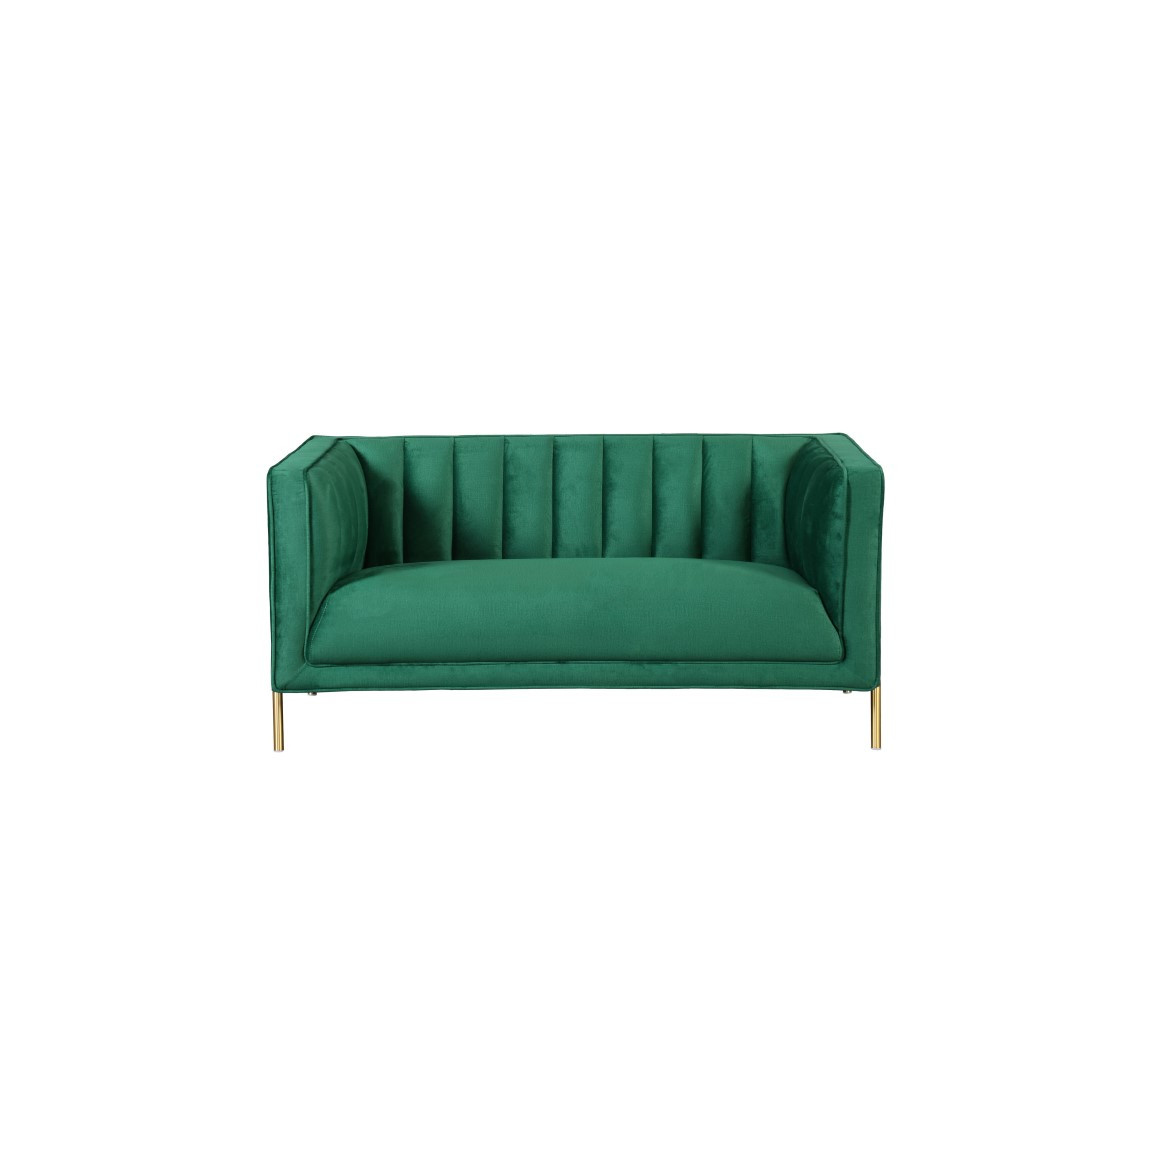 2 Seater Sofa Pittsburgh 433 | Green